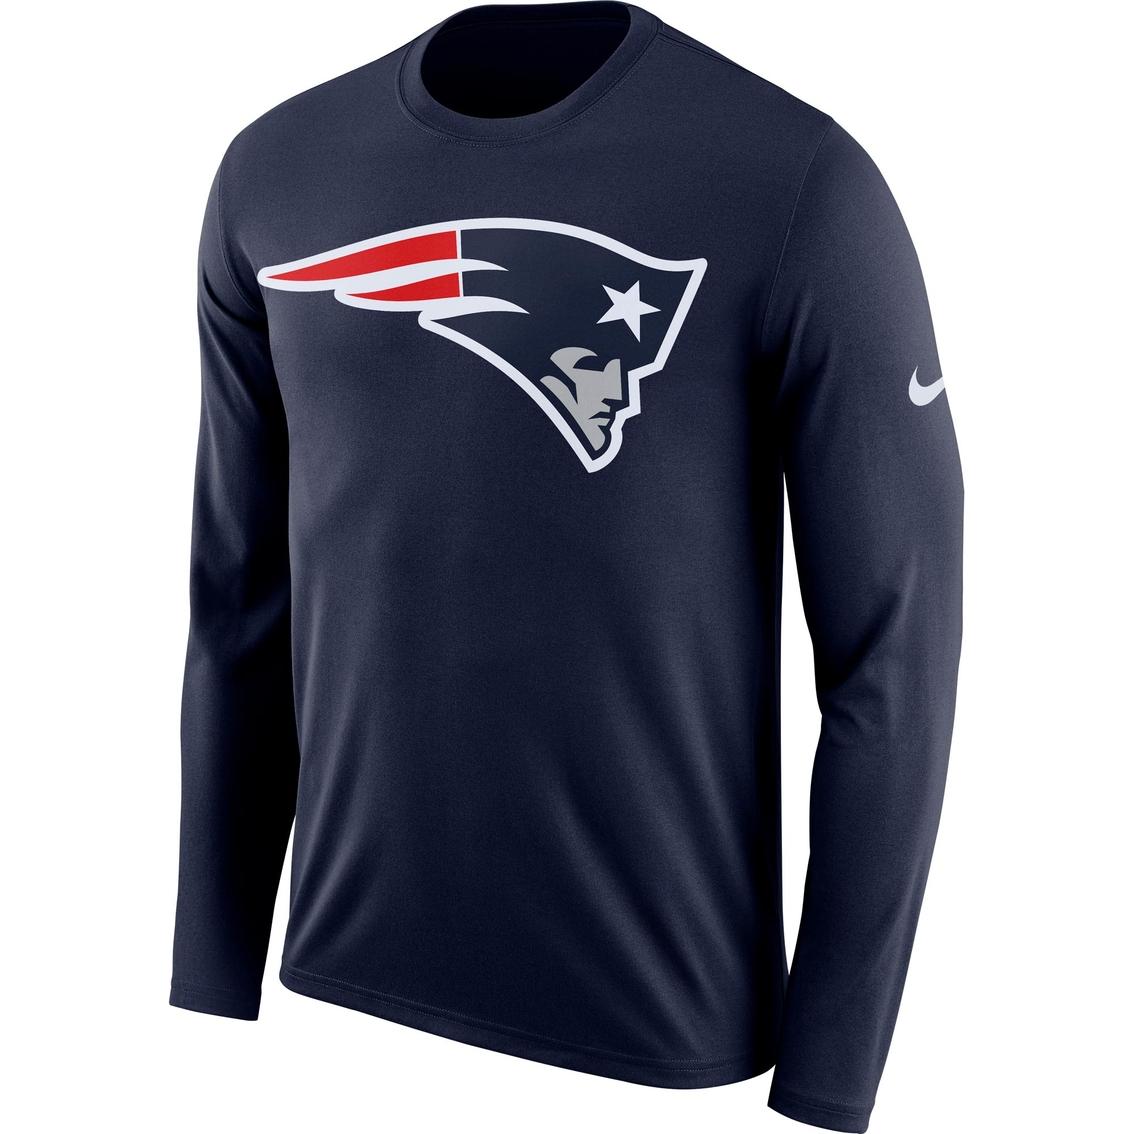 patriots england nfl nike tee shirts exchange